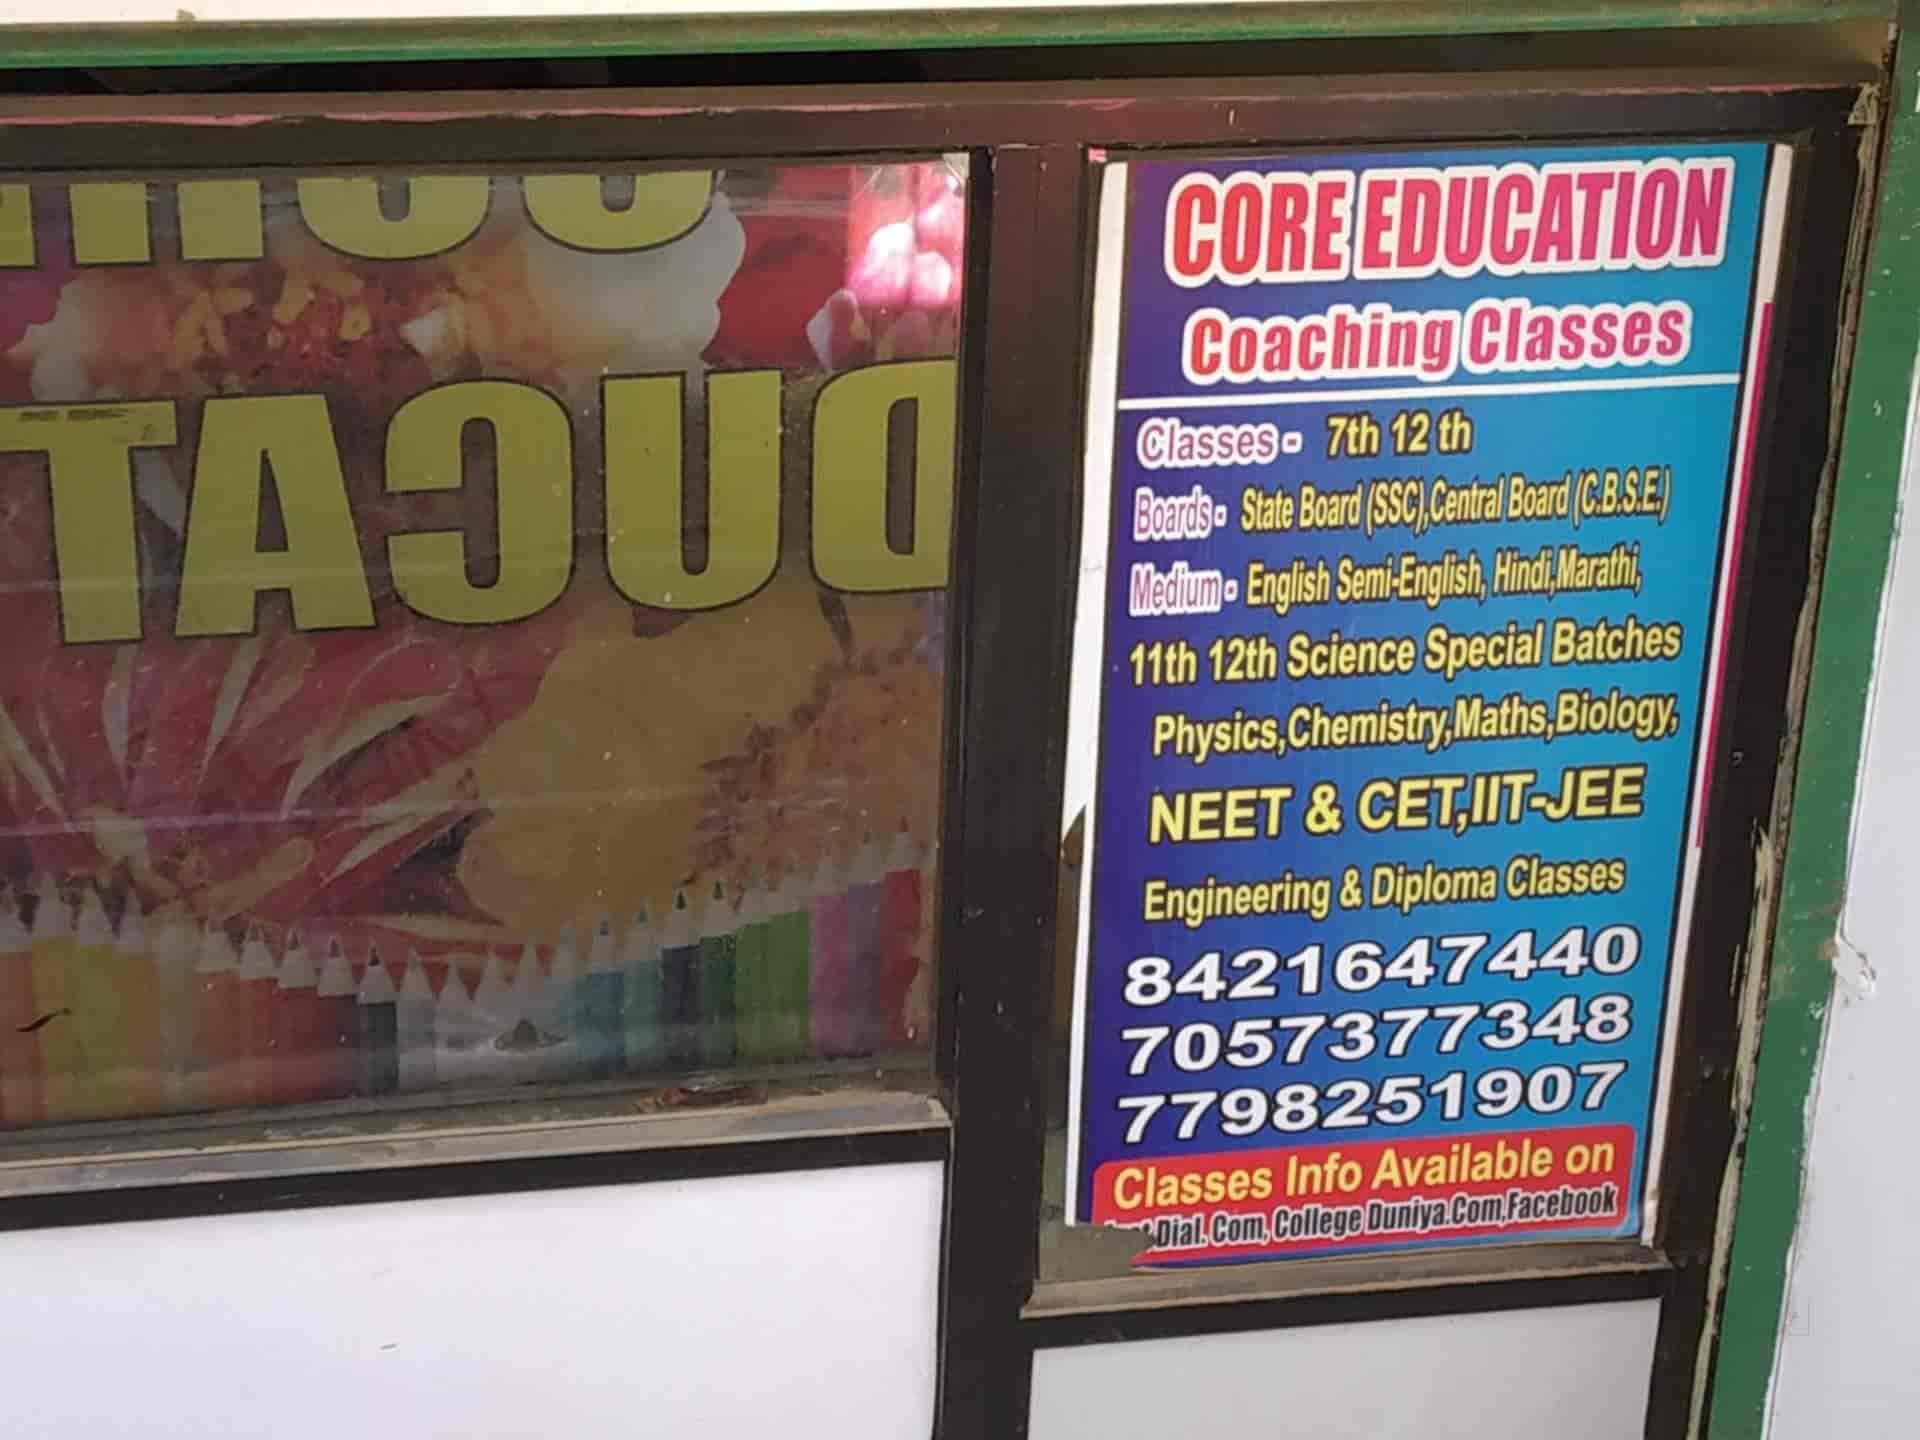 Core Education Coaching Classes Photos, Padegaon, Aurangabad